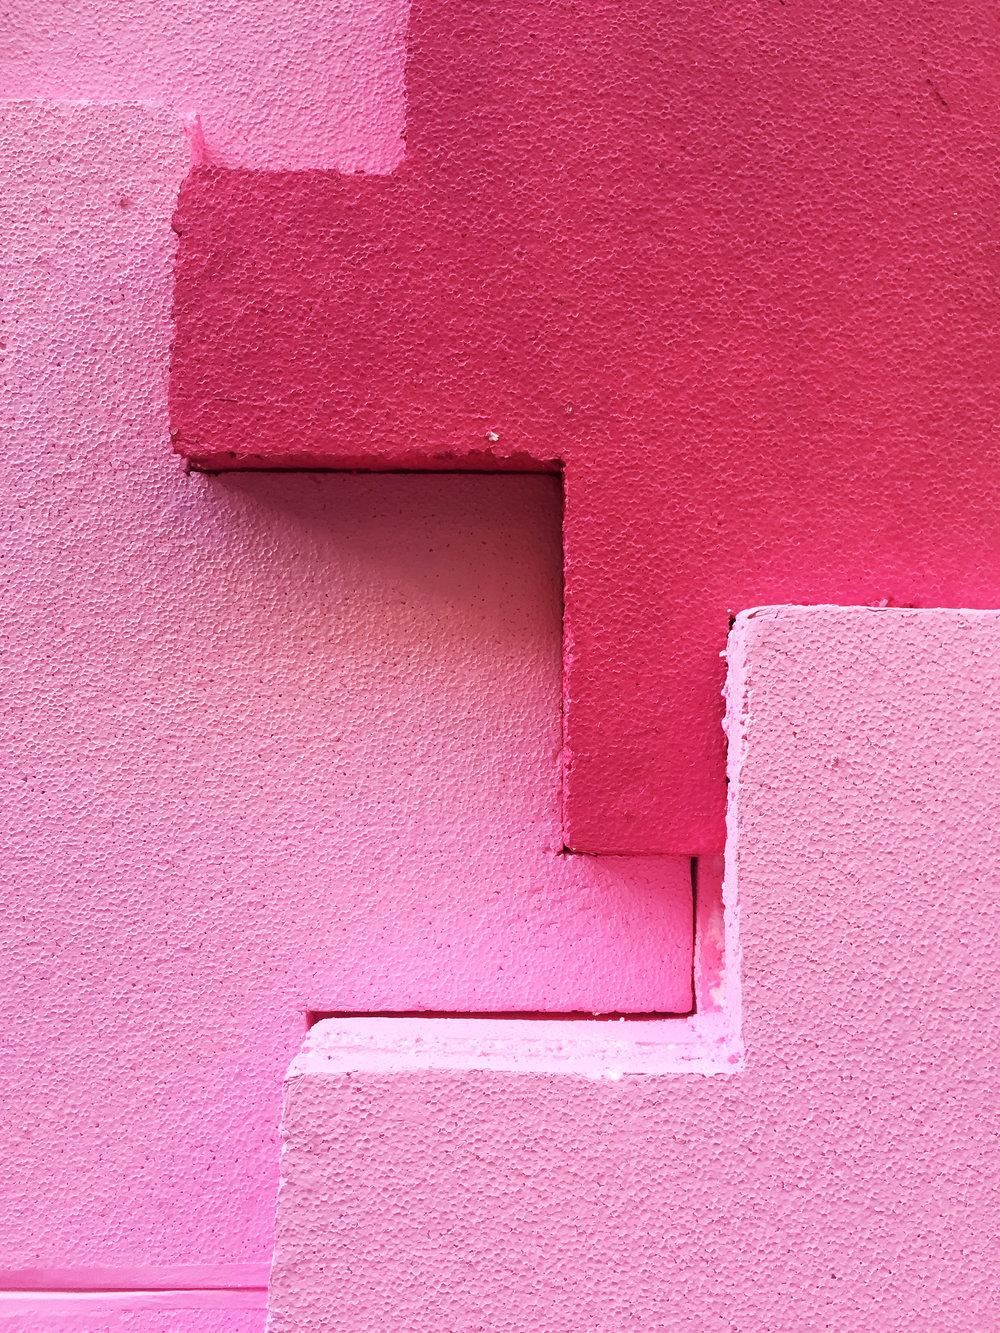 muralla roja 08.jpg